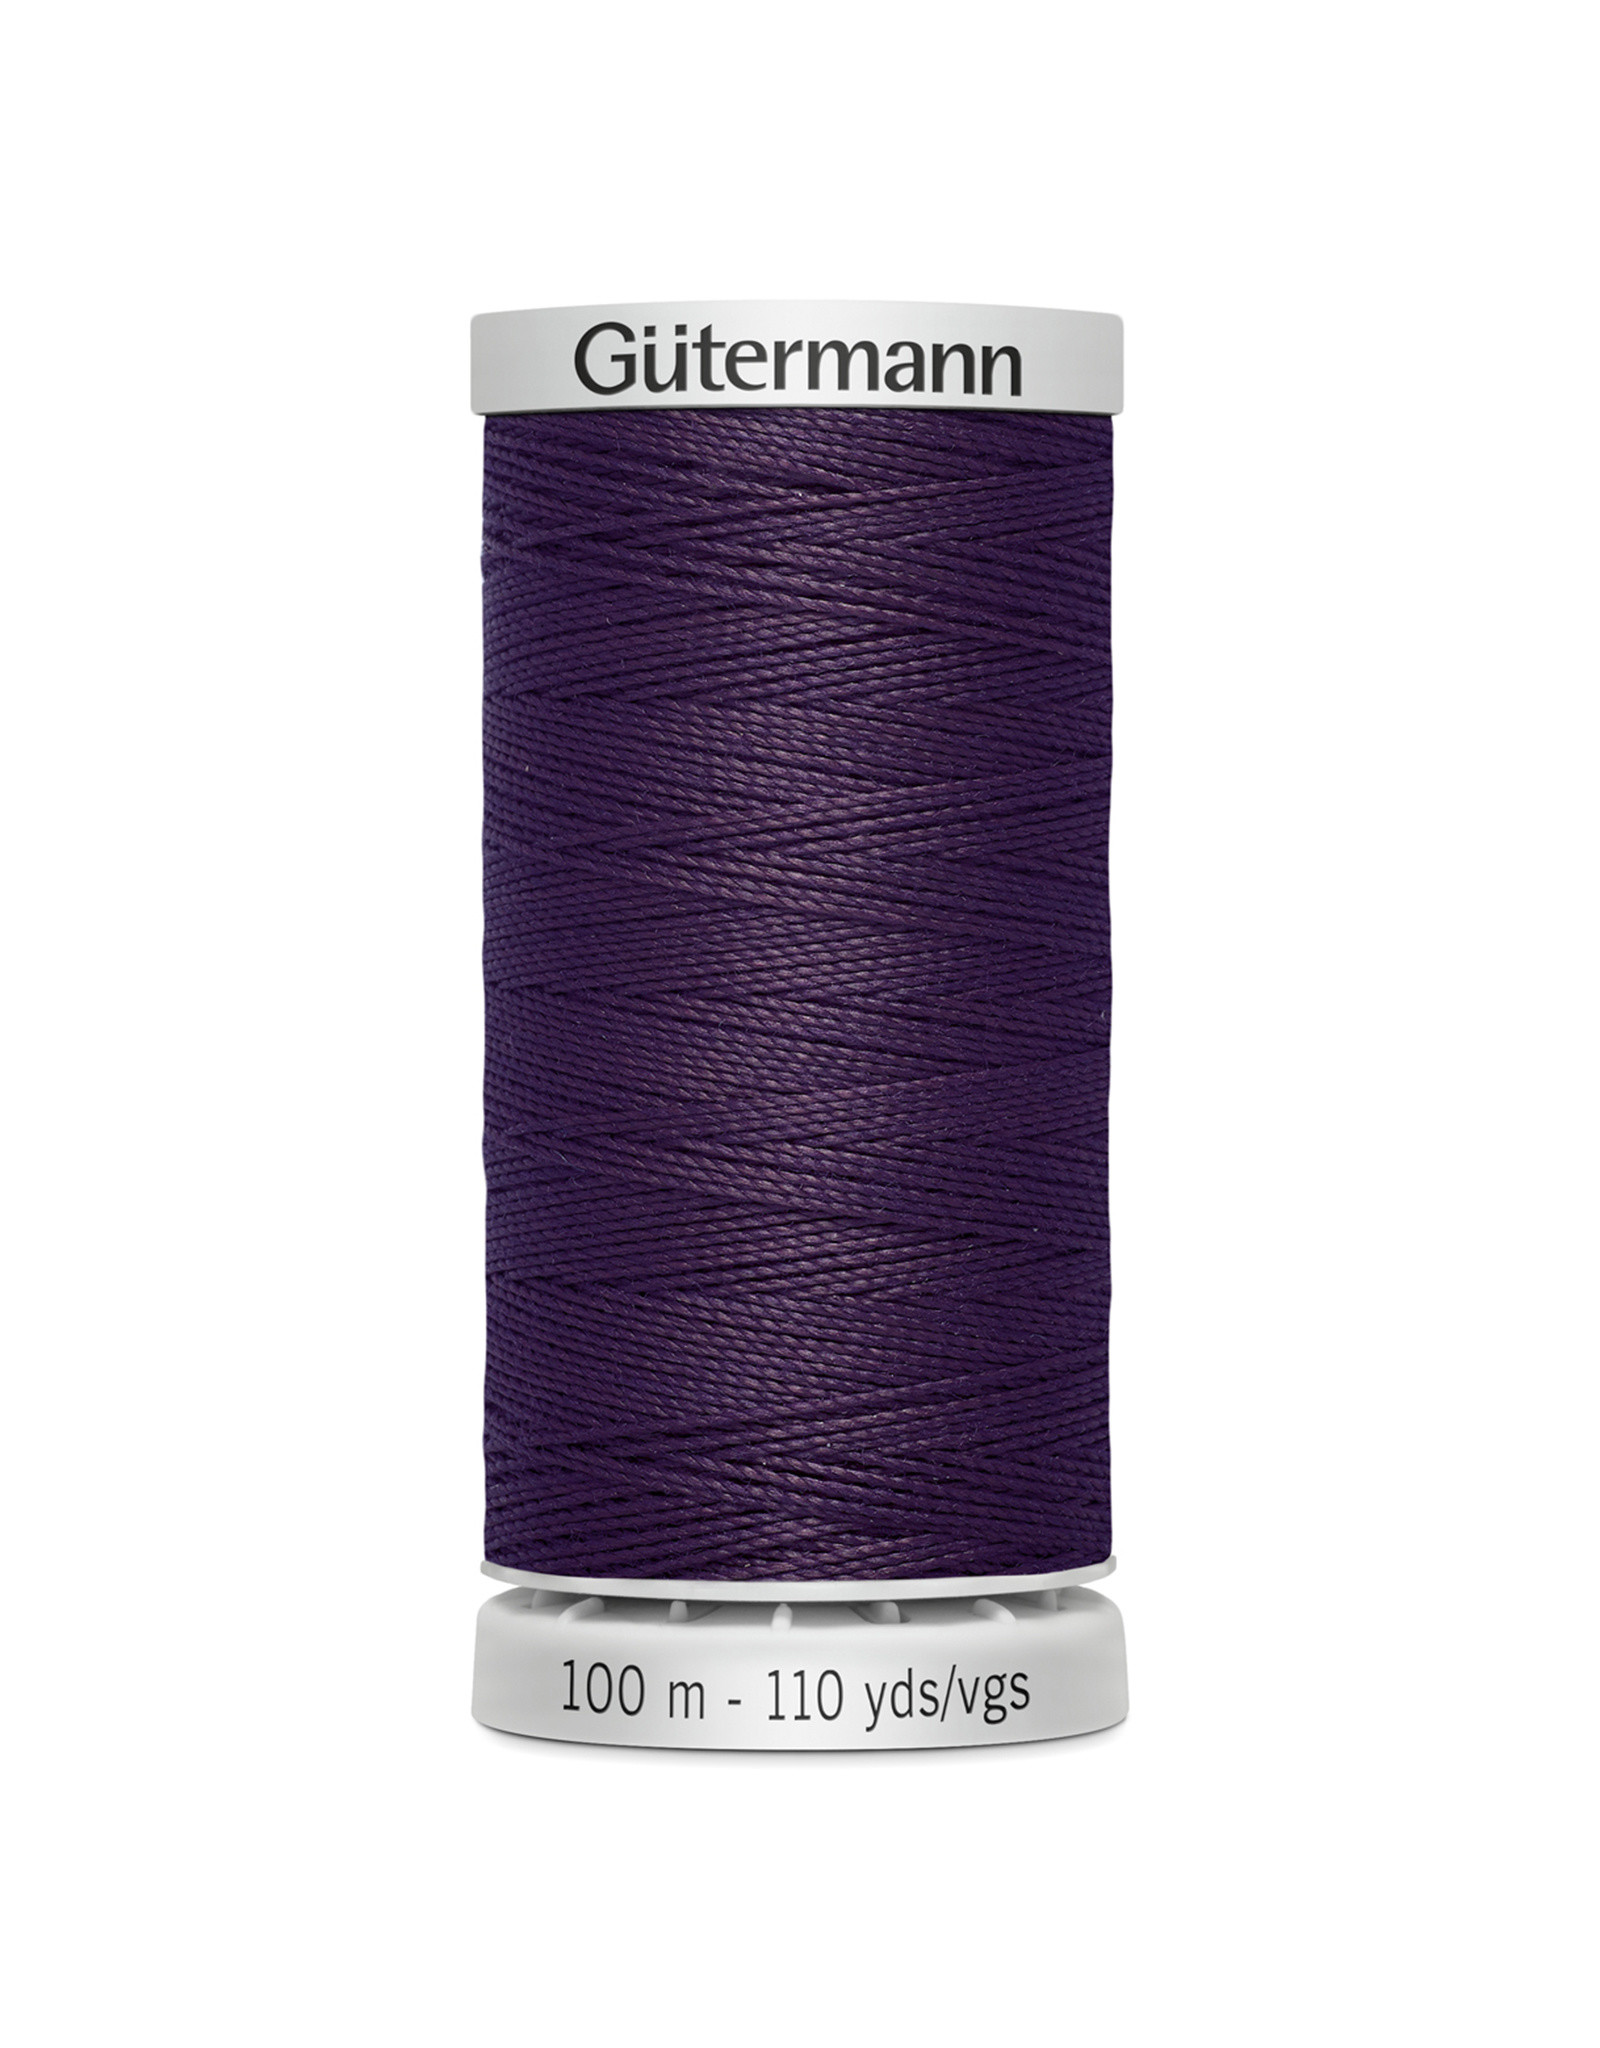 Gütermann Gütermann Super Strong thread 100 m - 512